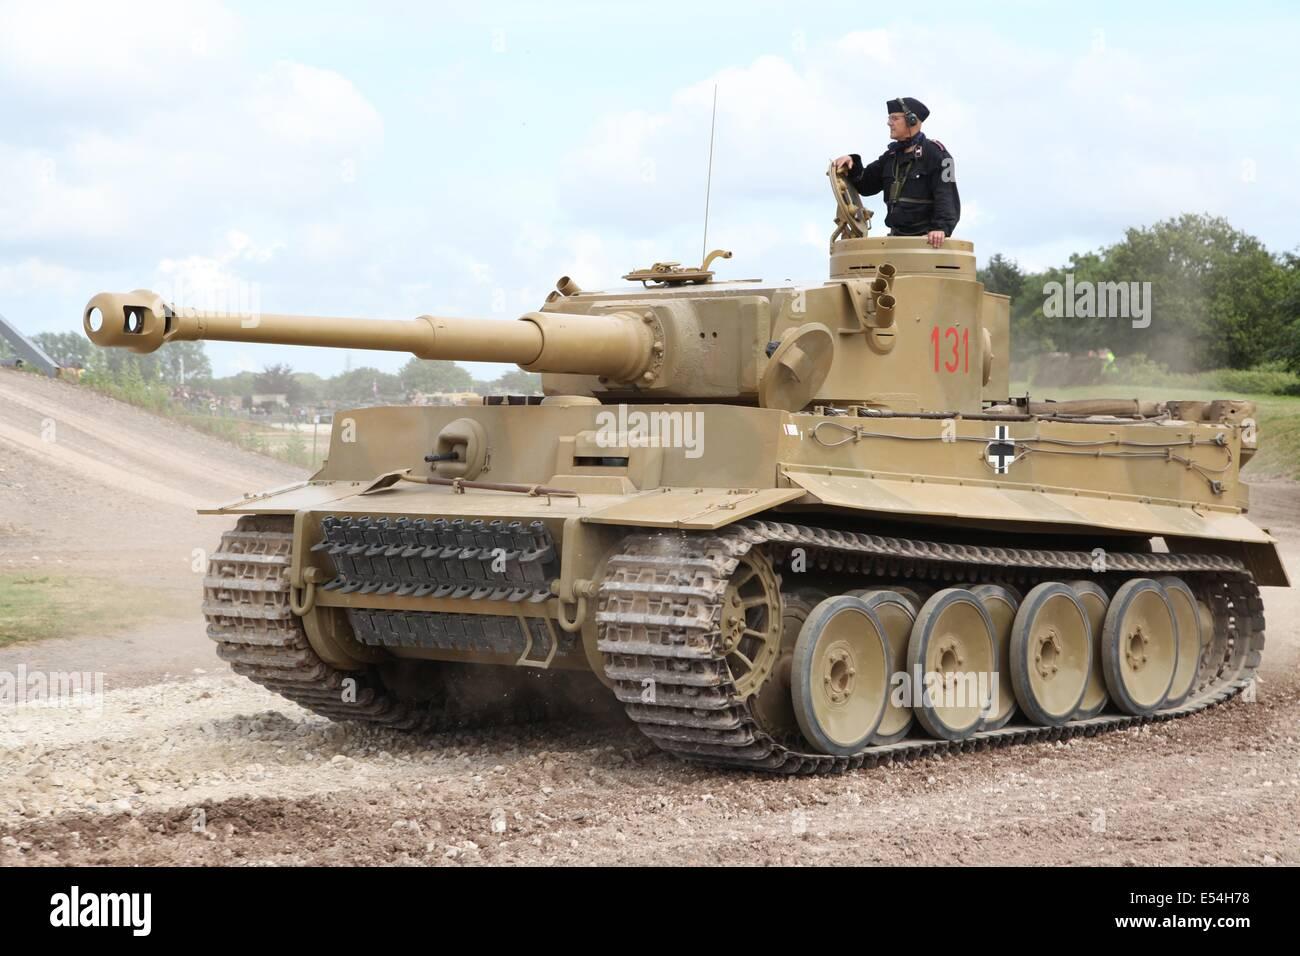 tiger 1 sd kfz 181 panzerkampfwagen vi ausf e stock. Black Bedroom Furniture Sets. Home Design Ideas